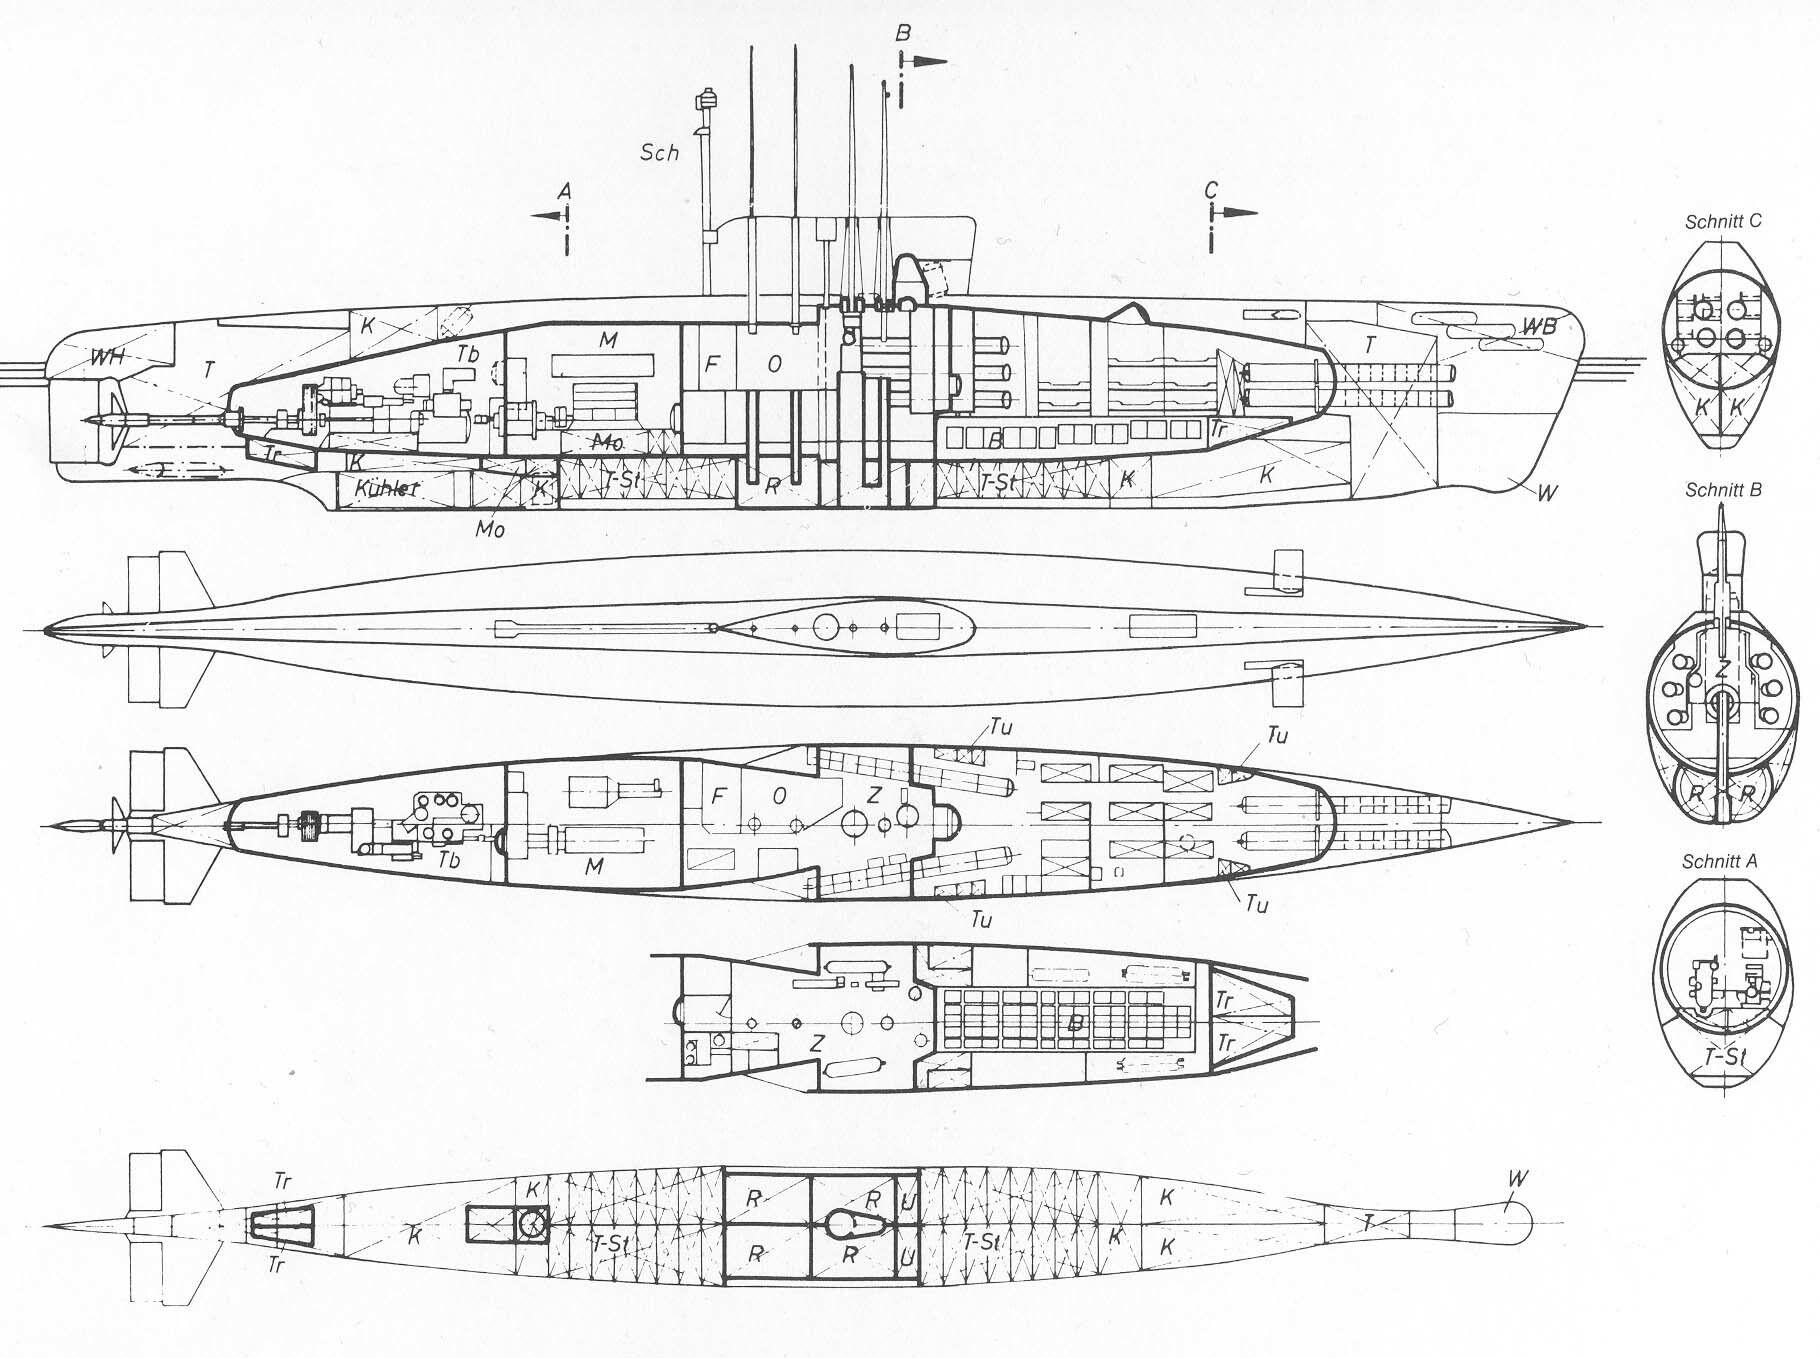 Pin By Joe Shepherd Ii On Bships Ger Subs Type Xxiii Xxvi